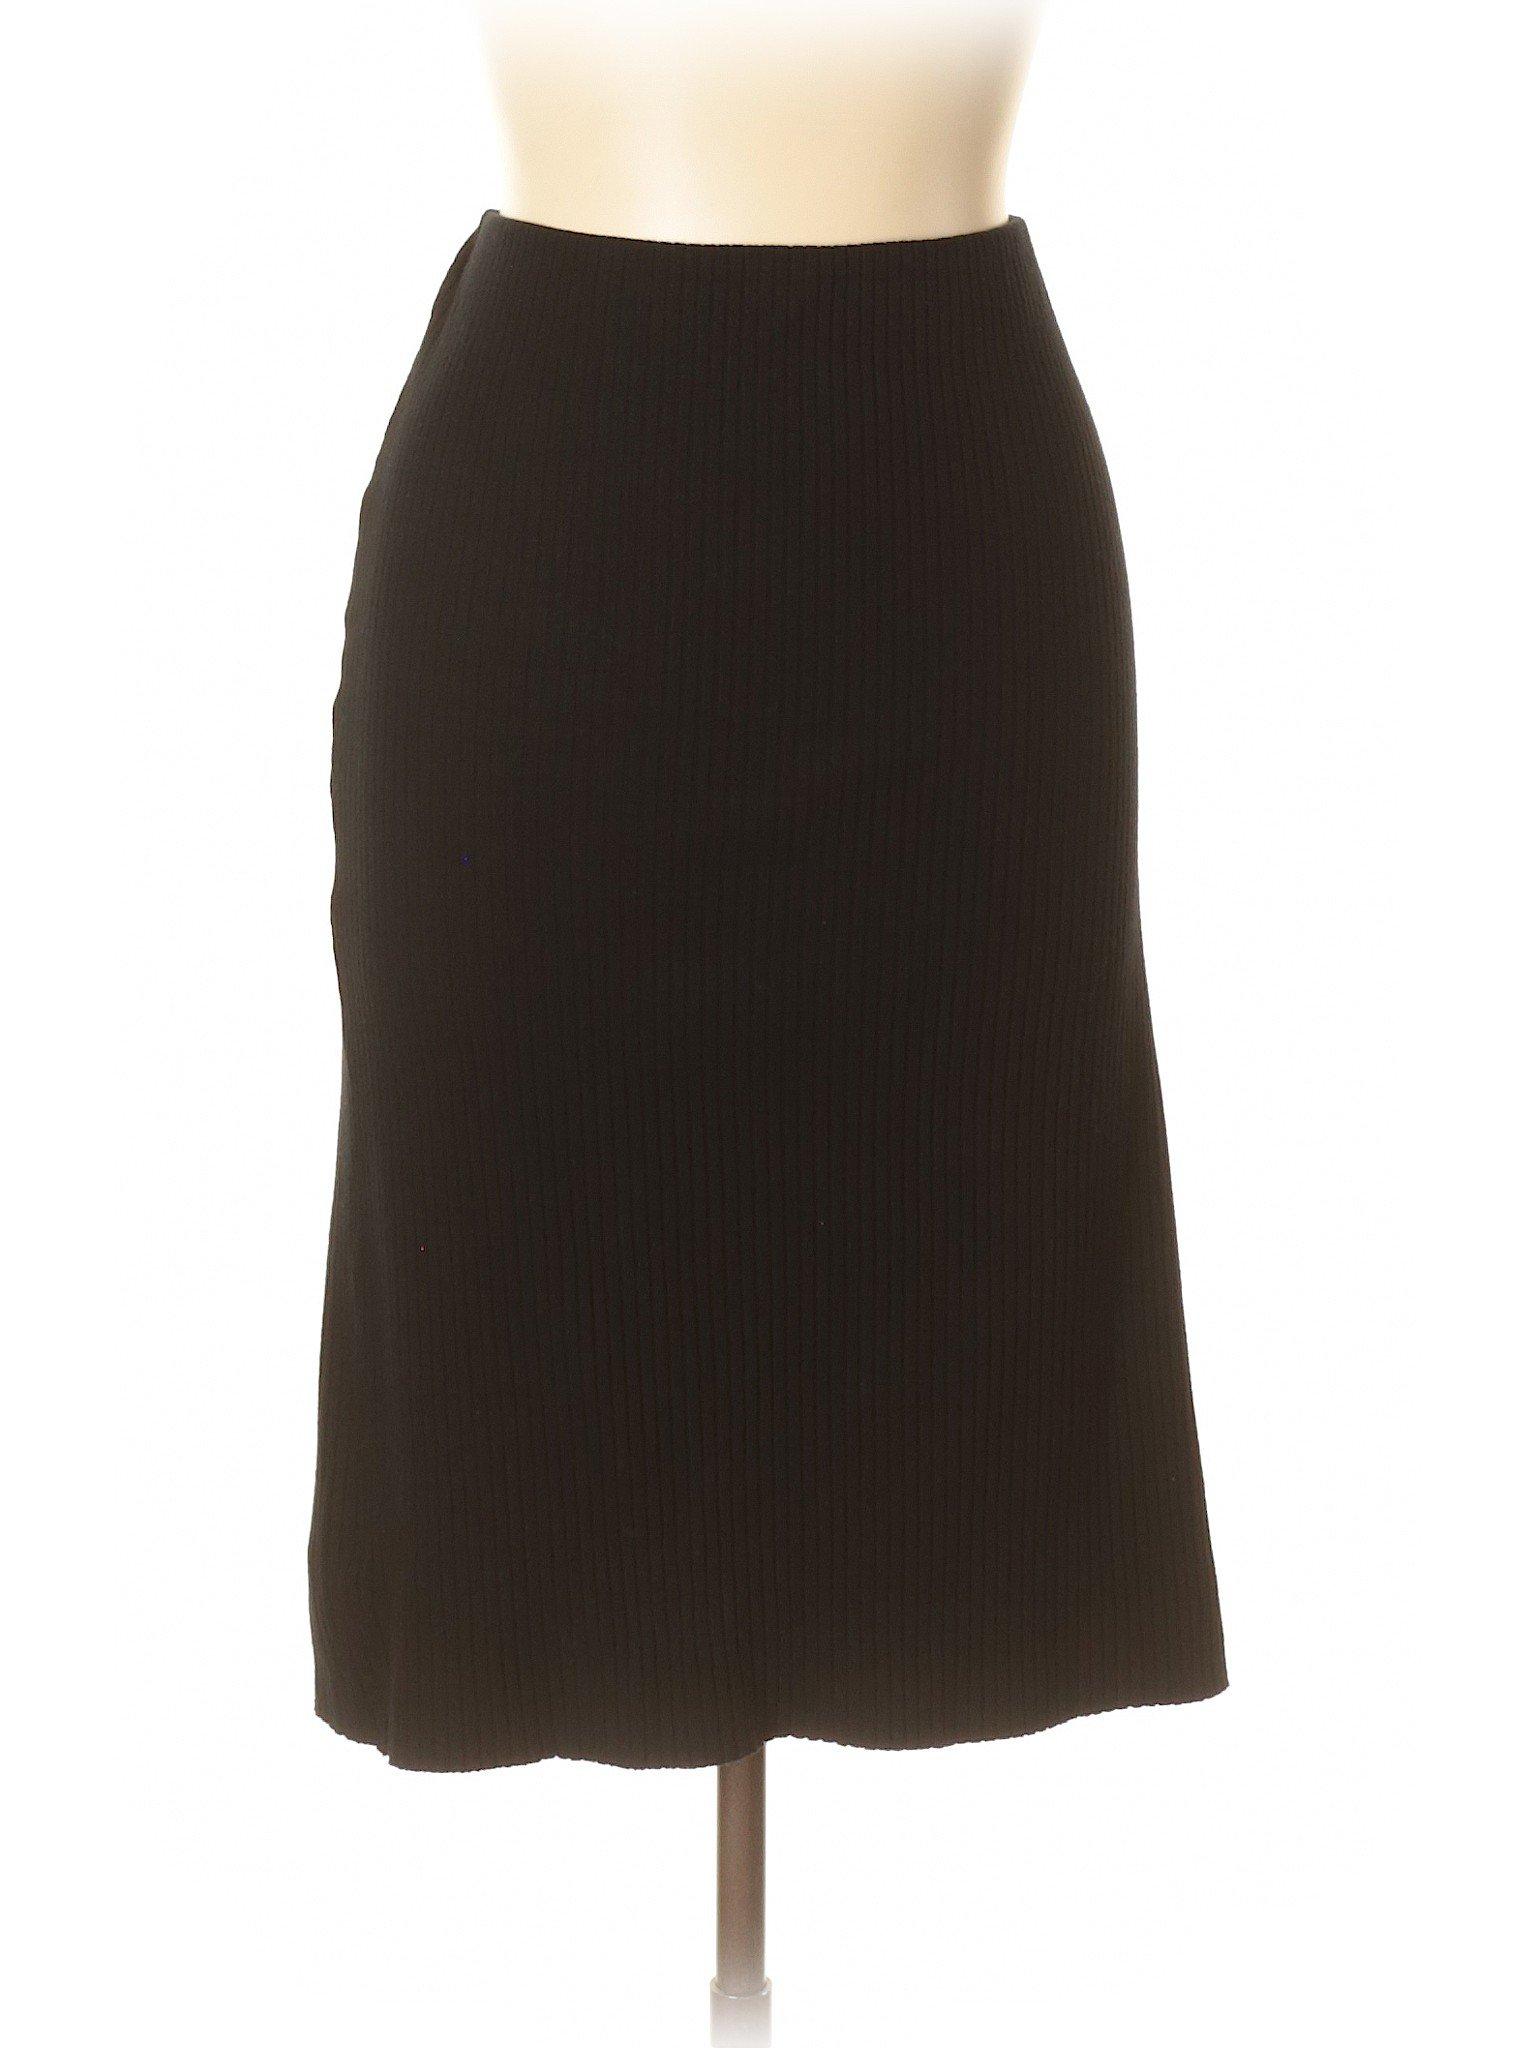 Casual Boutique Skirt Casual Casual Boutique Skirt Boutique Boutique Skirt Casual qWxPnSTA